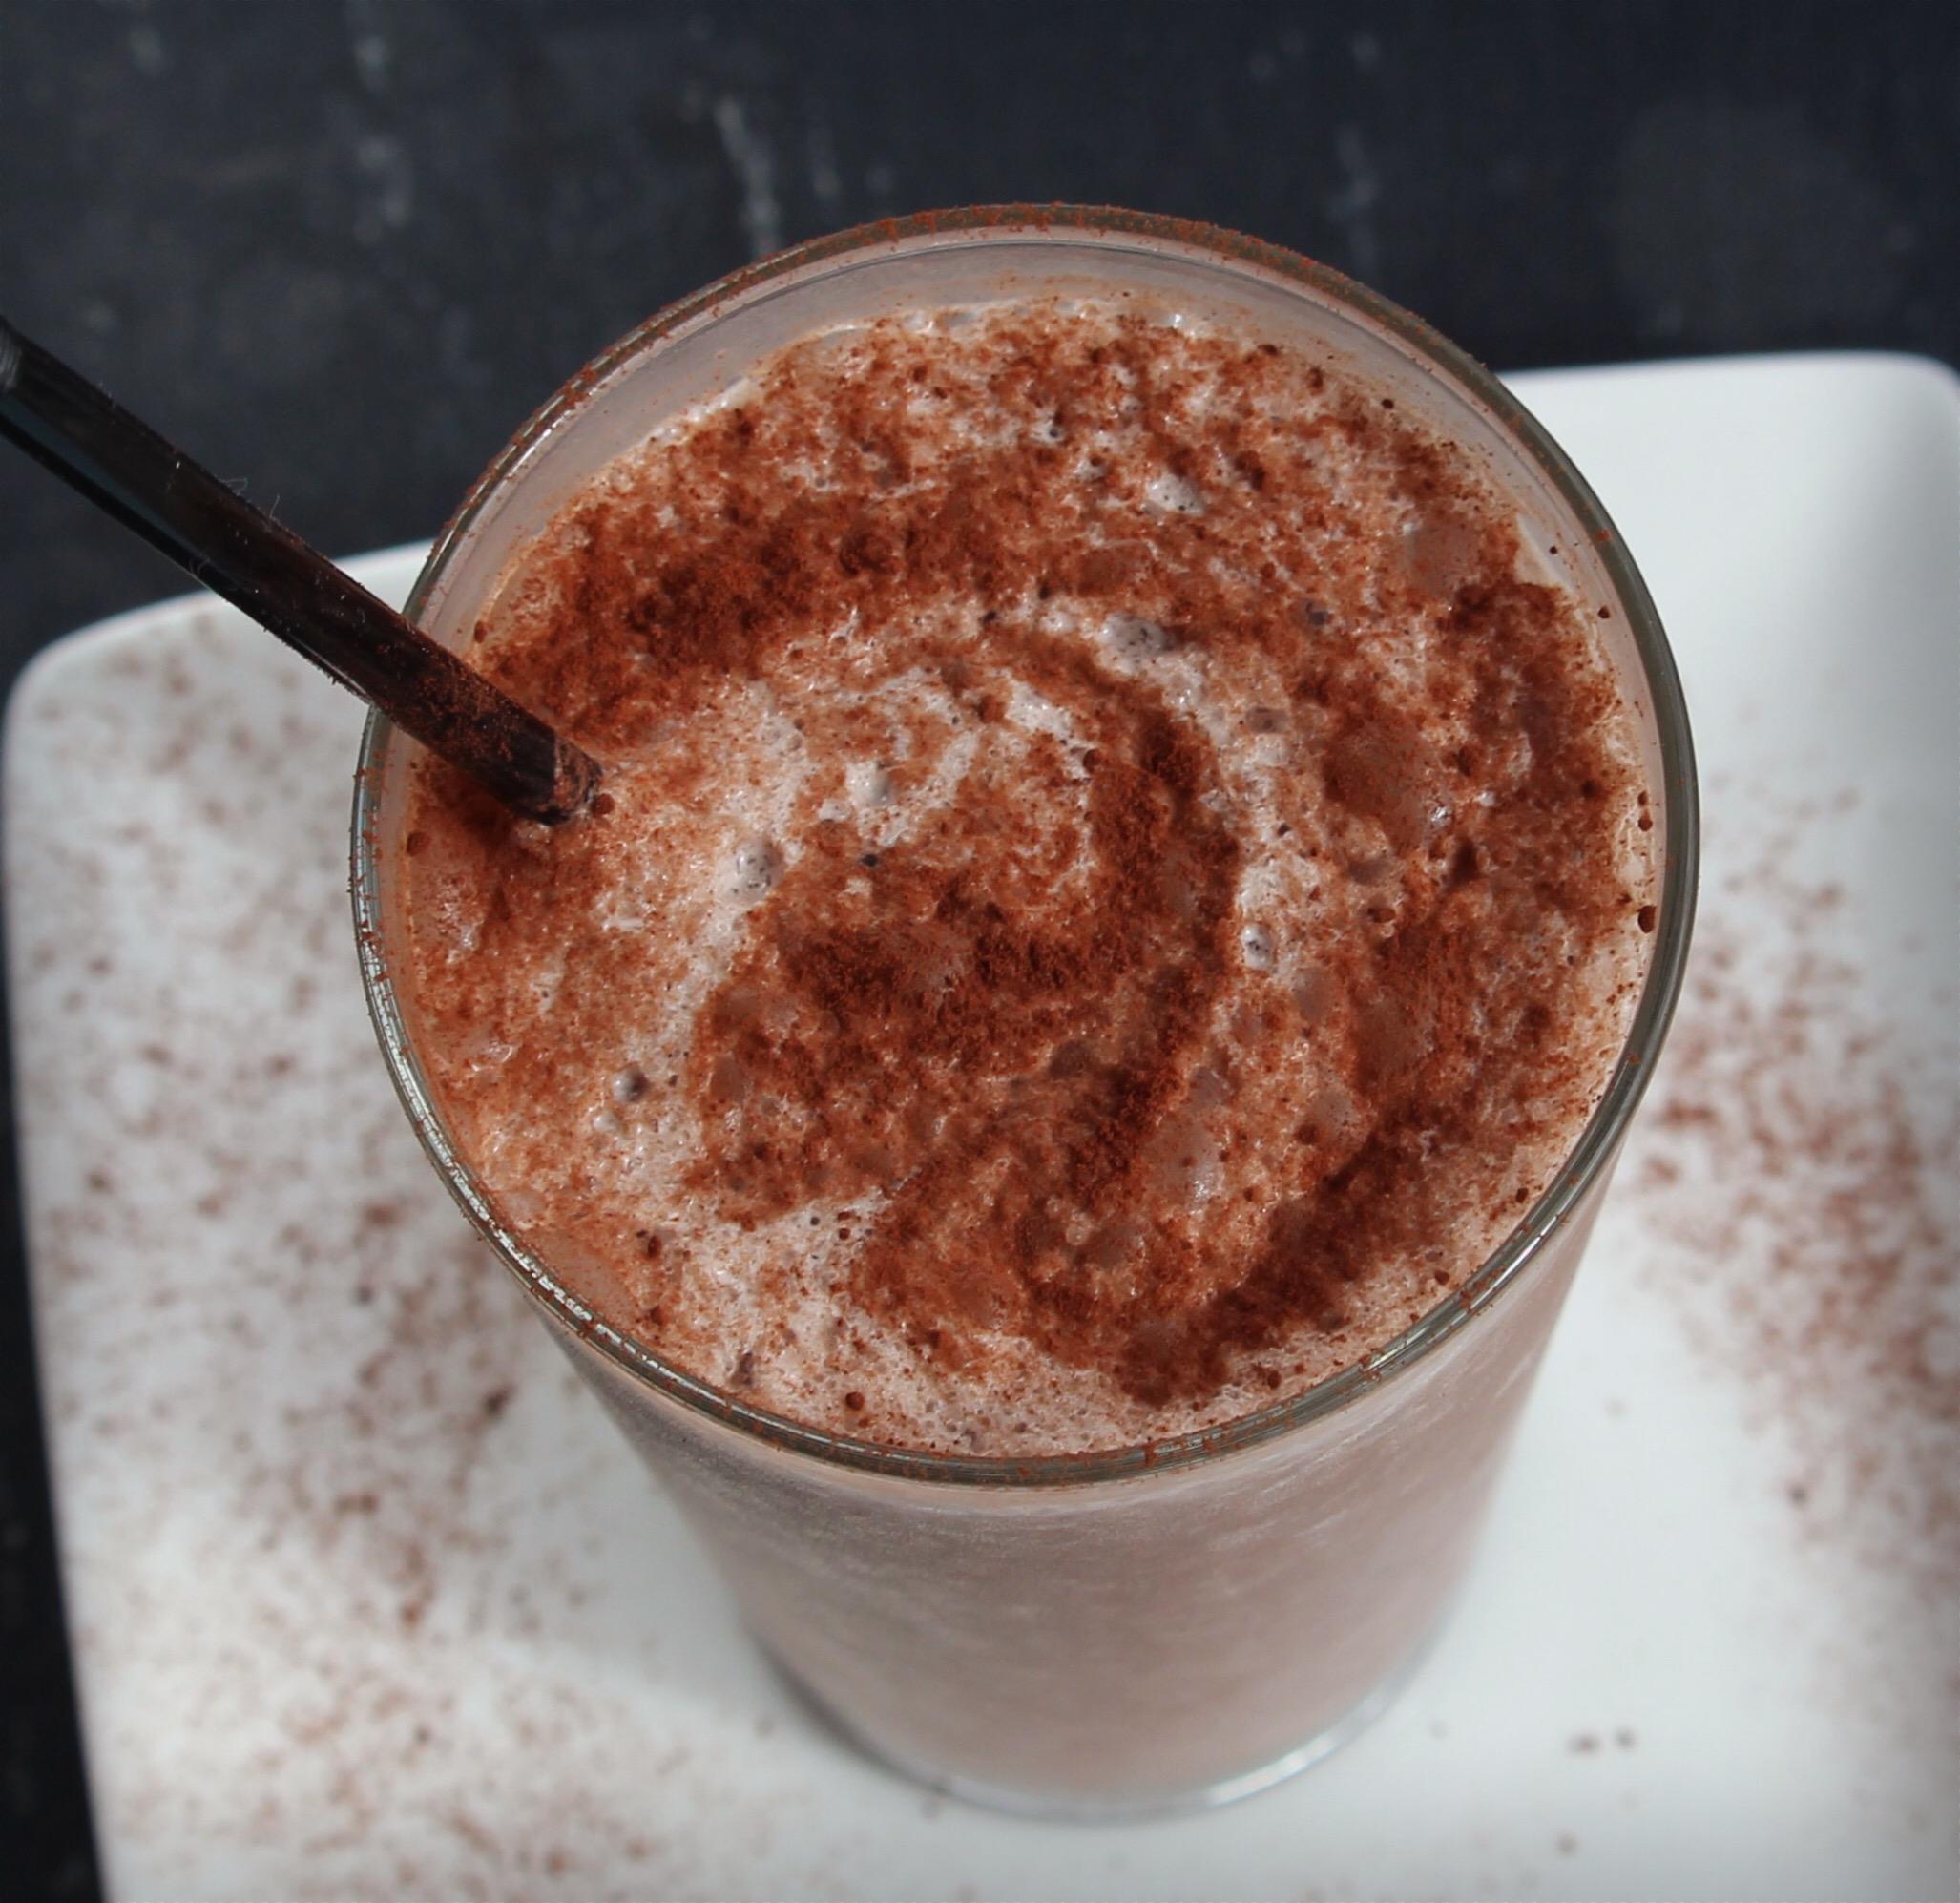 Chocolate Sunset Smoothie